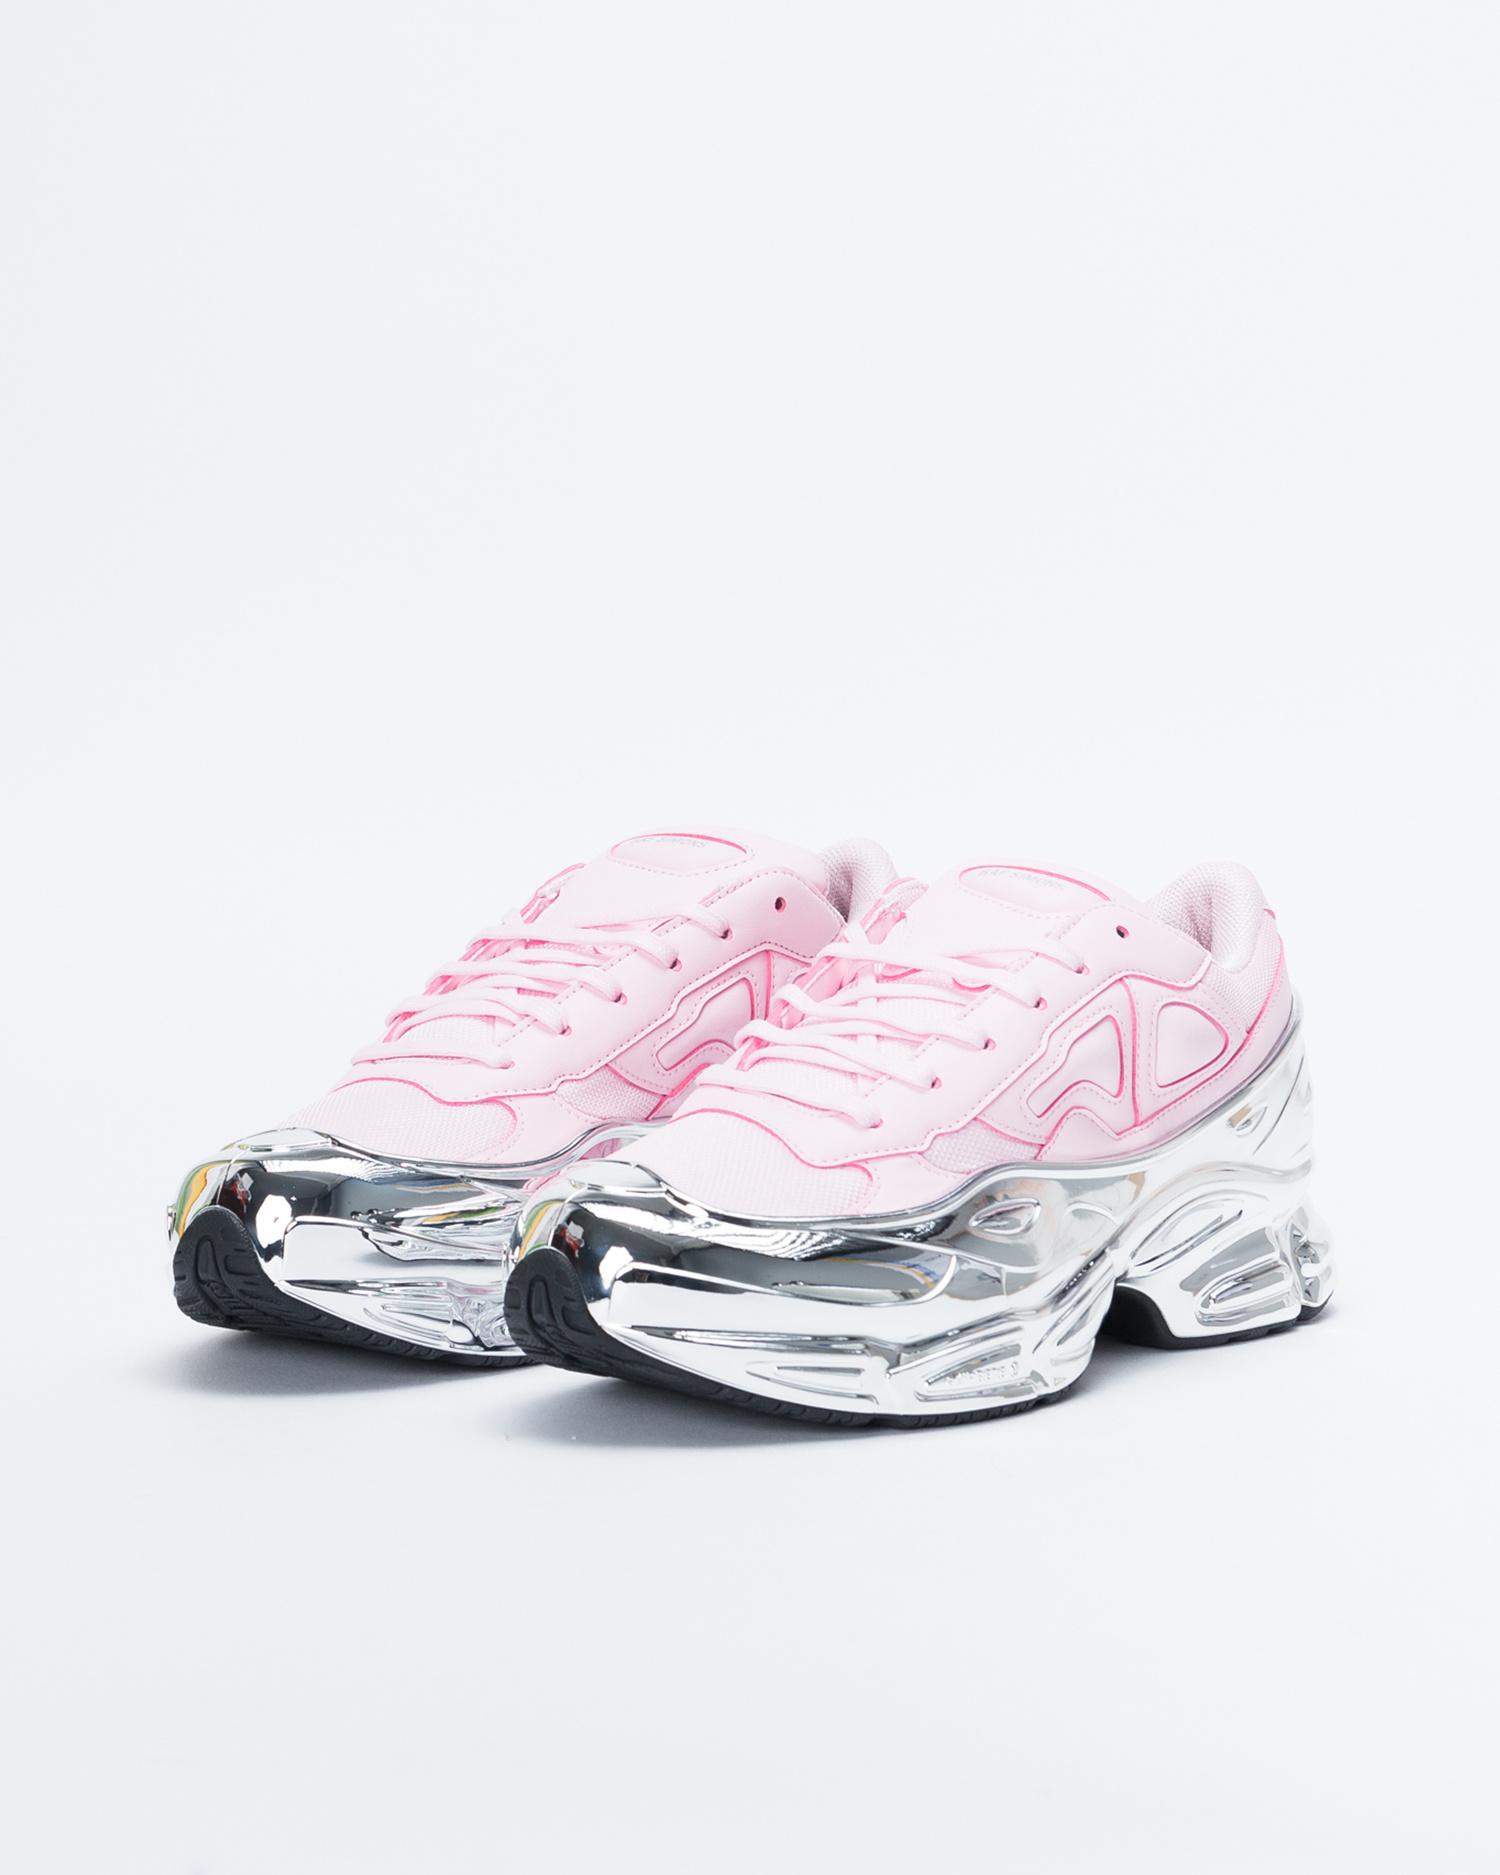 ed2ccdd5340 Adidas Raf Simons Ozweego Cpink/Silvmt/Silvmt - Avenue Store